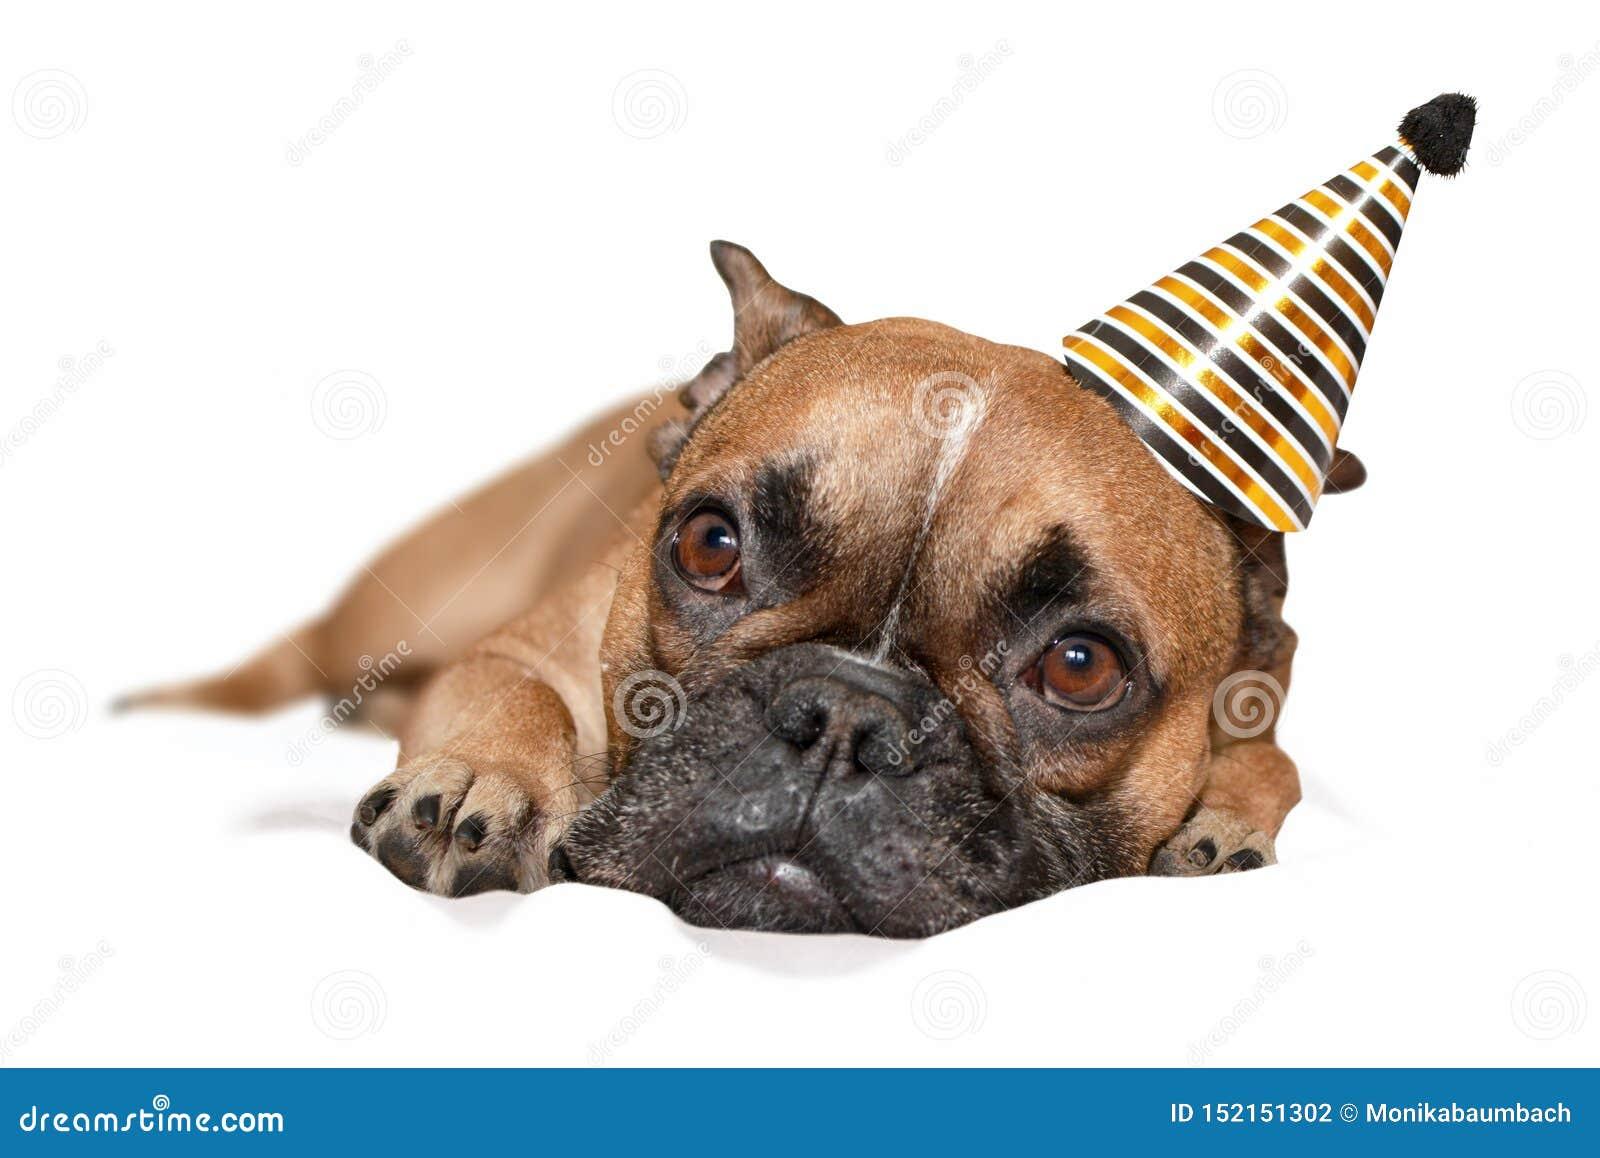 Leuke kleine Franse Buldoghond met zwarte en gouden van de partij nieuwe jaar of verjaardag partijhoed op hoofd die op witte acht